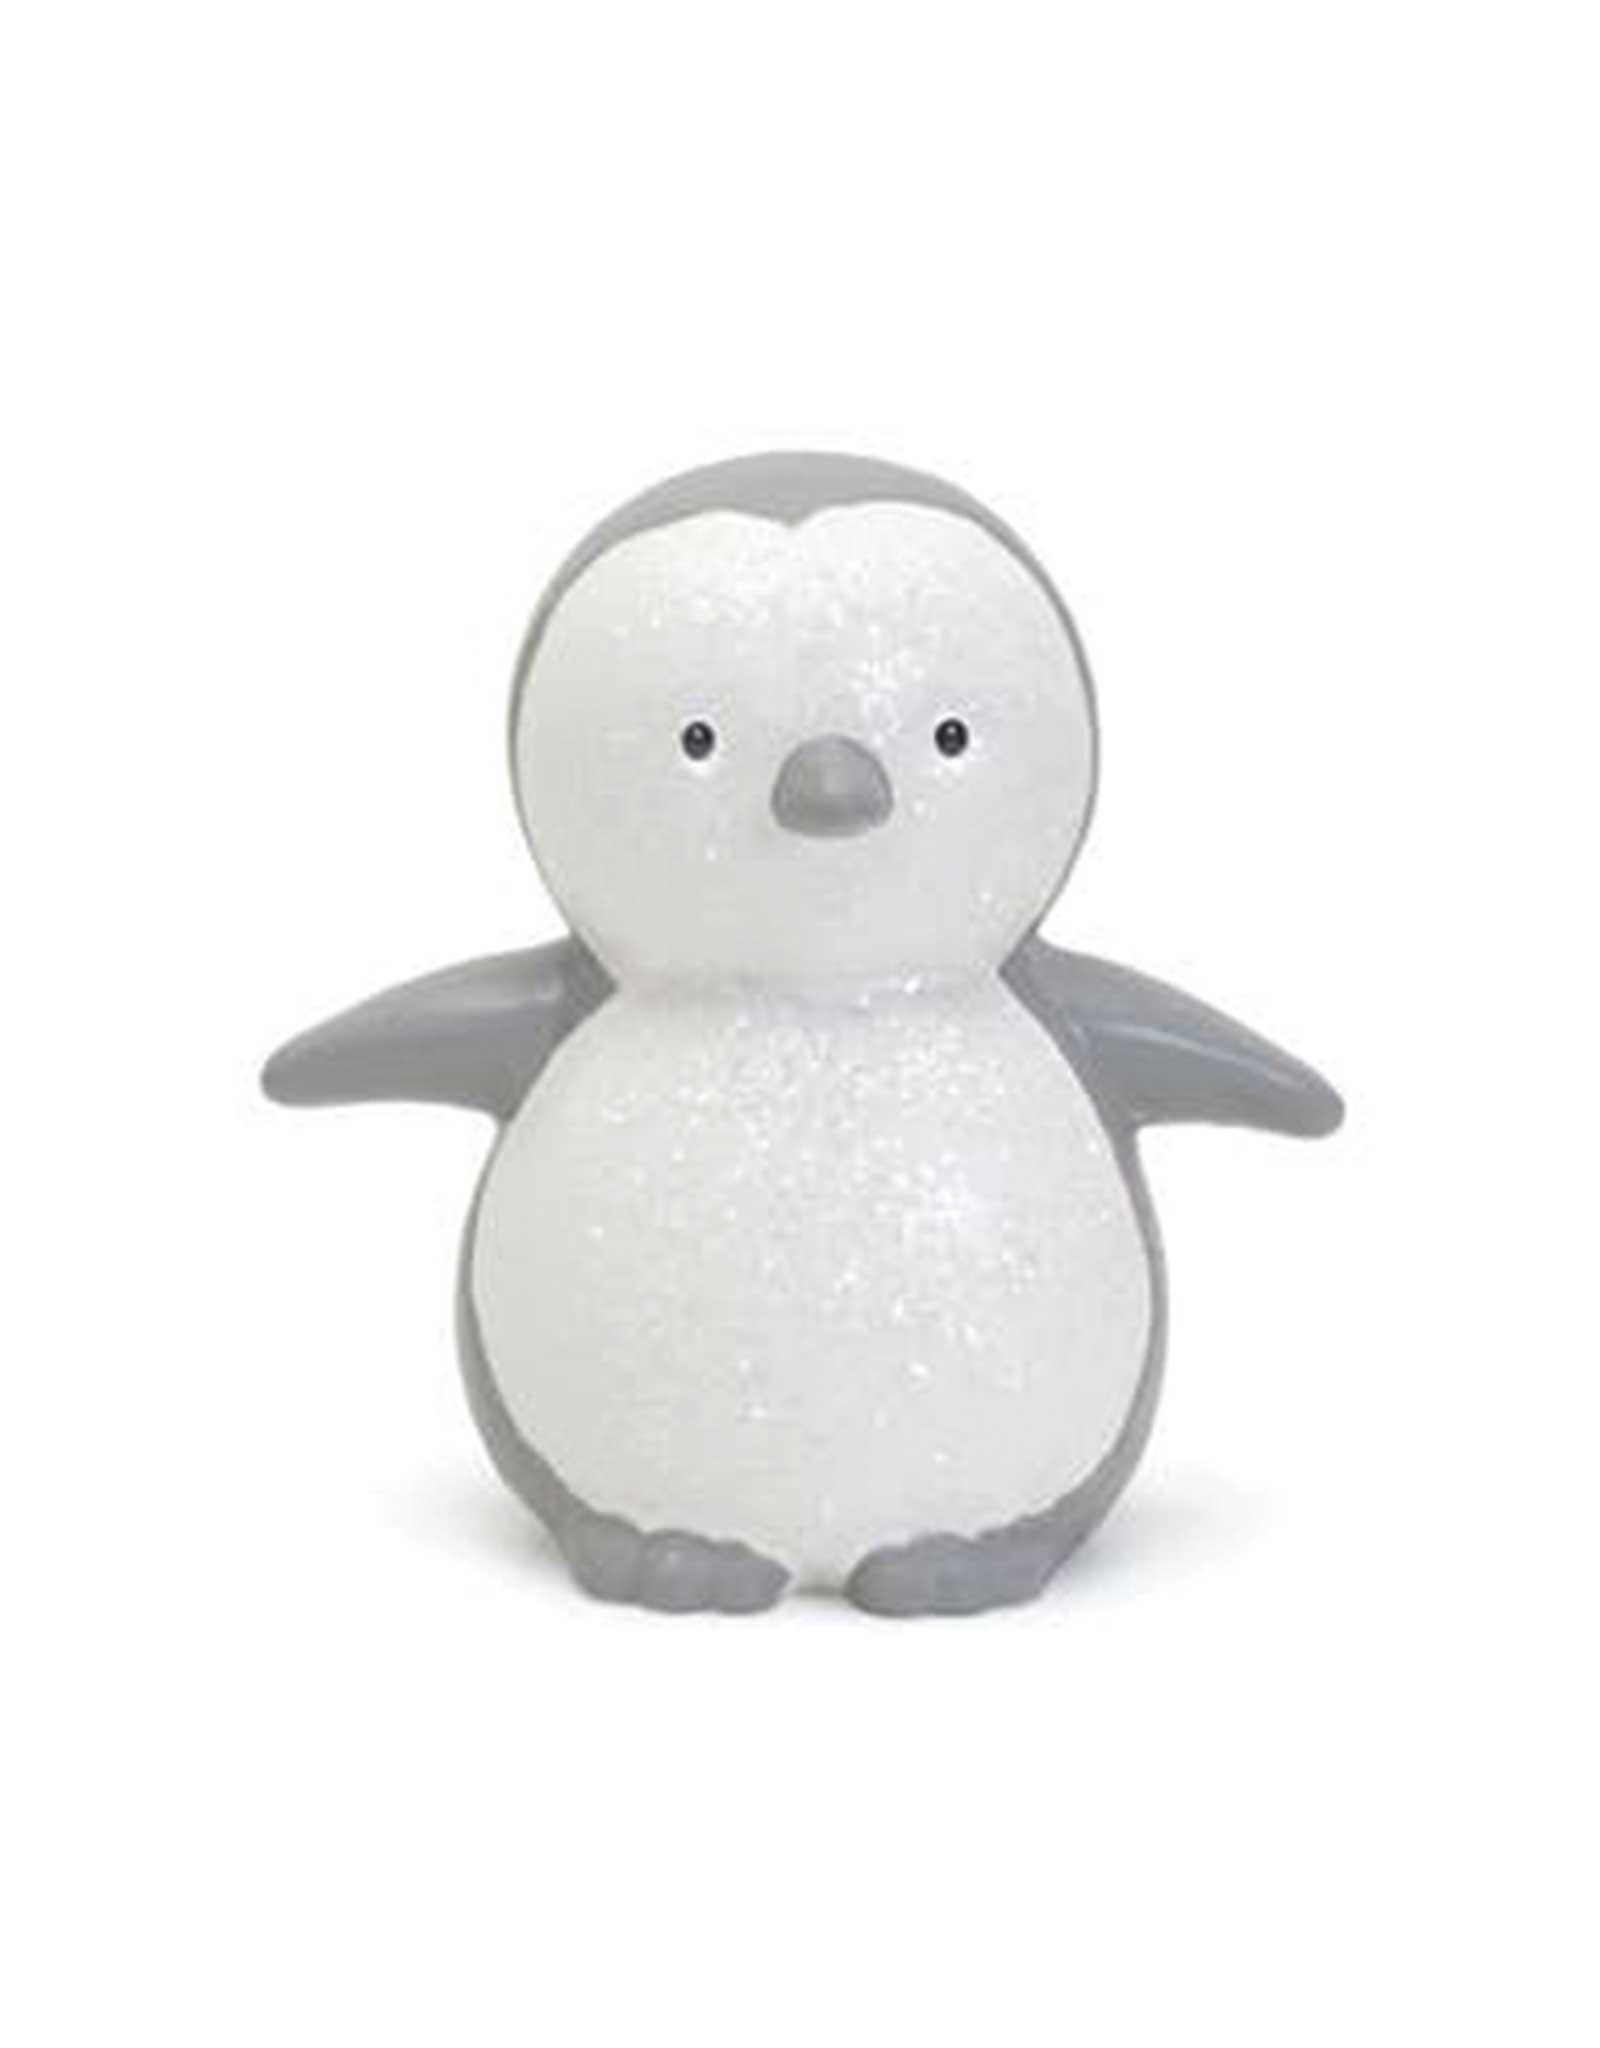 Child to Cherish Bank - Peter The Penguin Gray And White